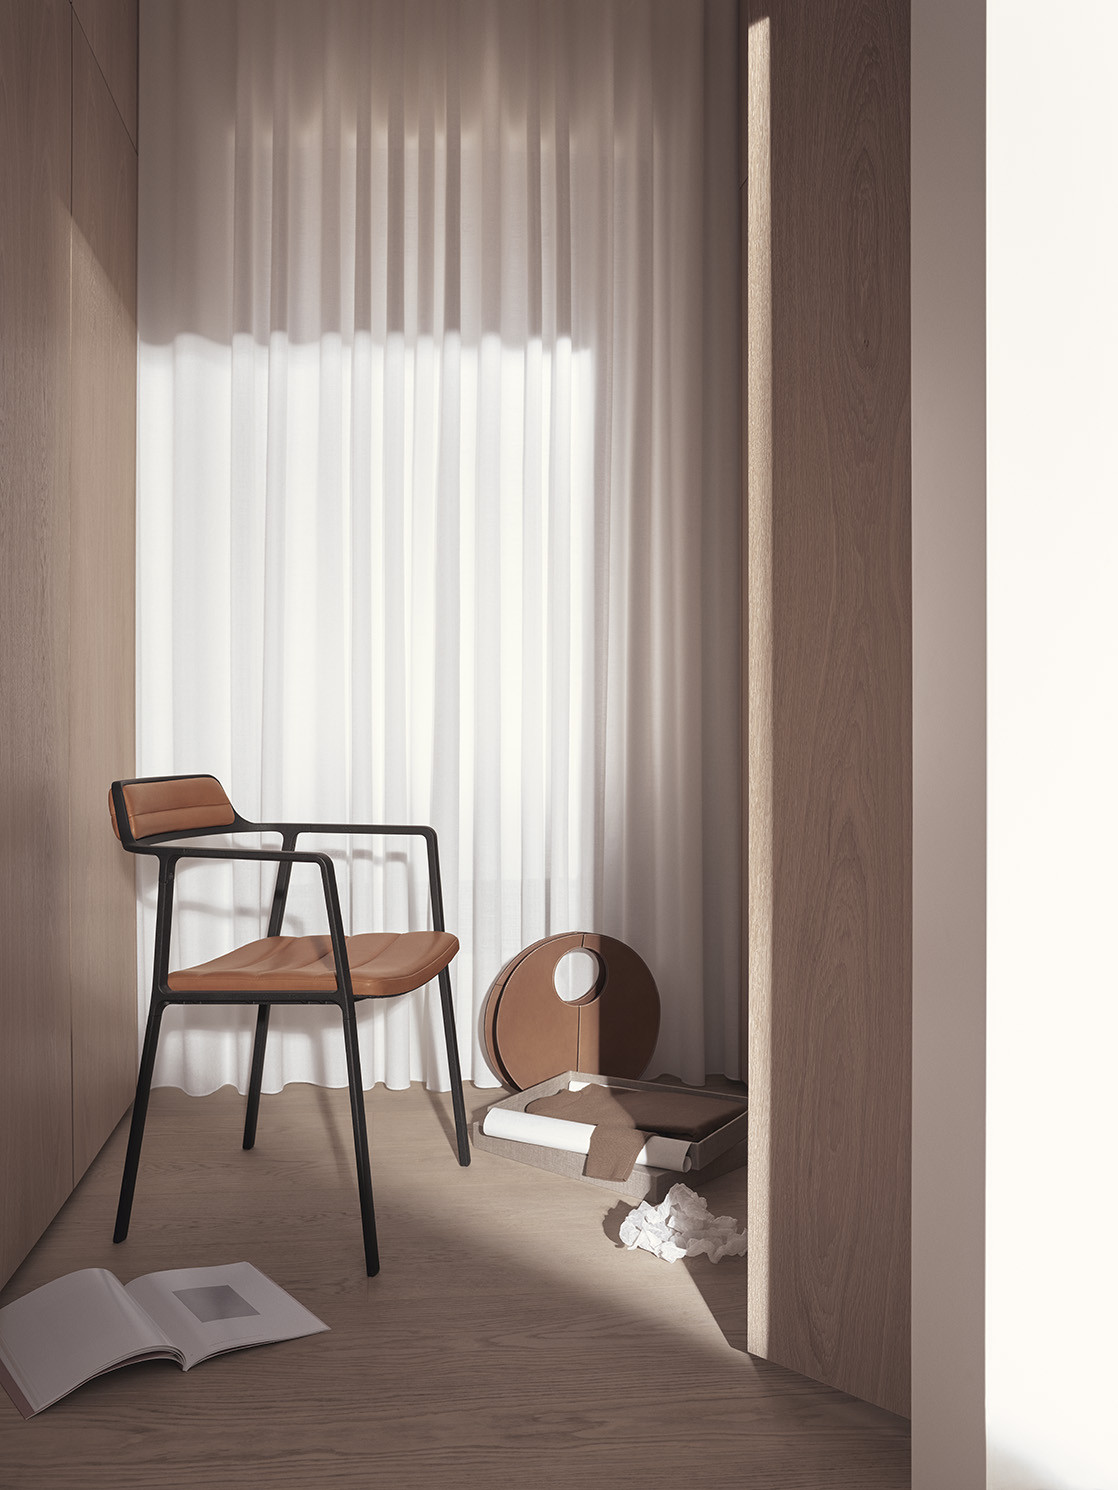 vipp Chair Leather VIPP451, 45170, 5705953167026